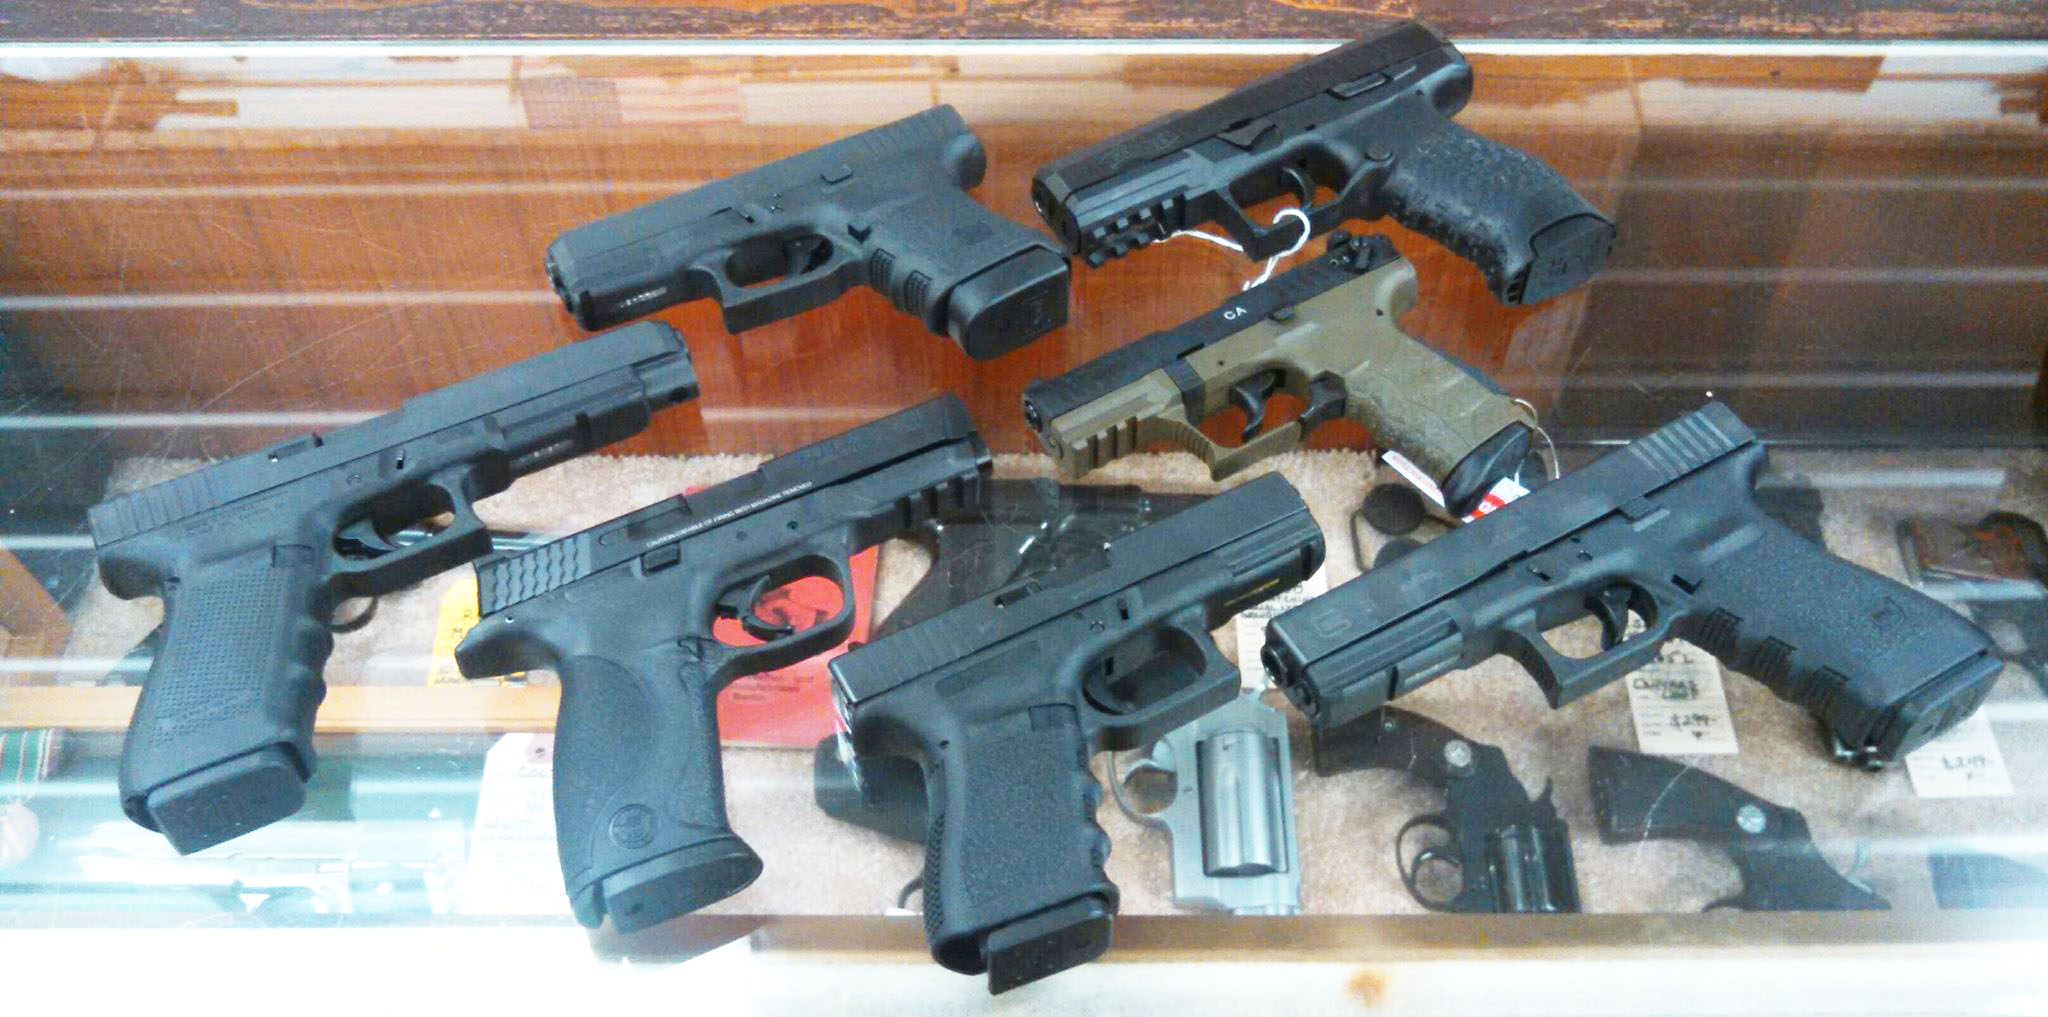 Gun Dealer Berlin Maryland, New & Used Guns, Ammo, AR15, AK